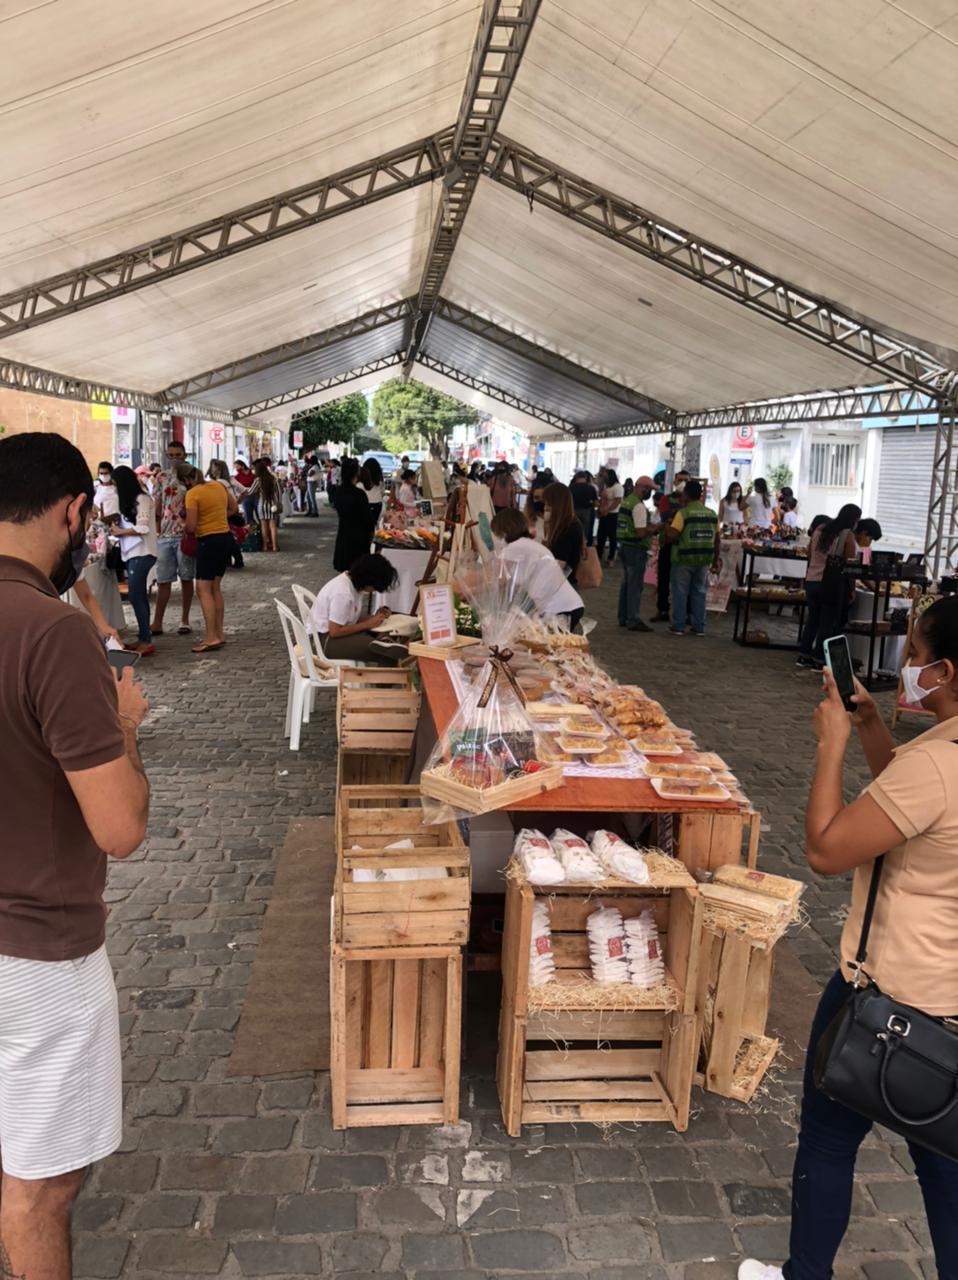 Feira de Artesanato supera expectativa de vendas no município de Eunápolis 23